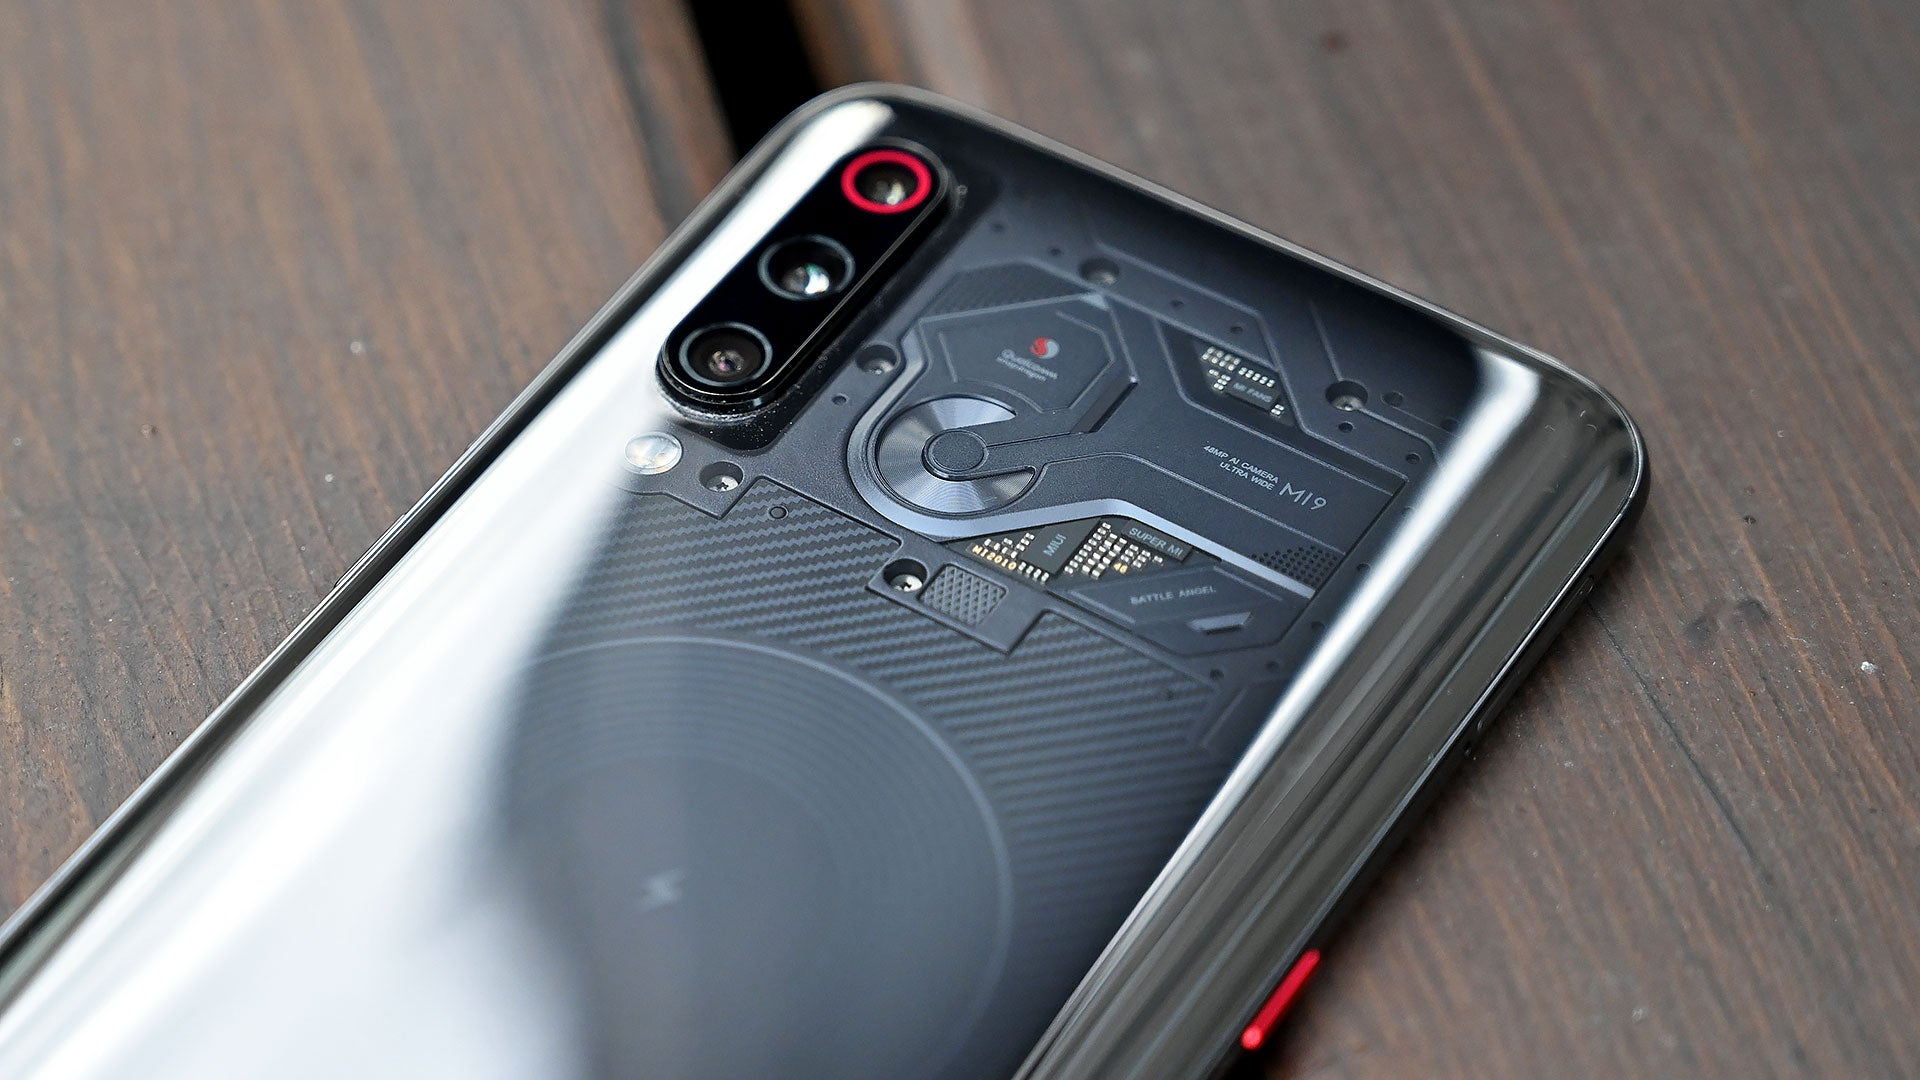 Xiaomi Mi 9 Hands-on: A Mid-Range Tease From Overseas